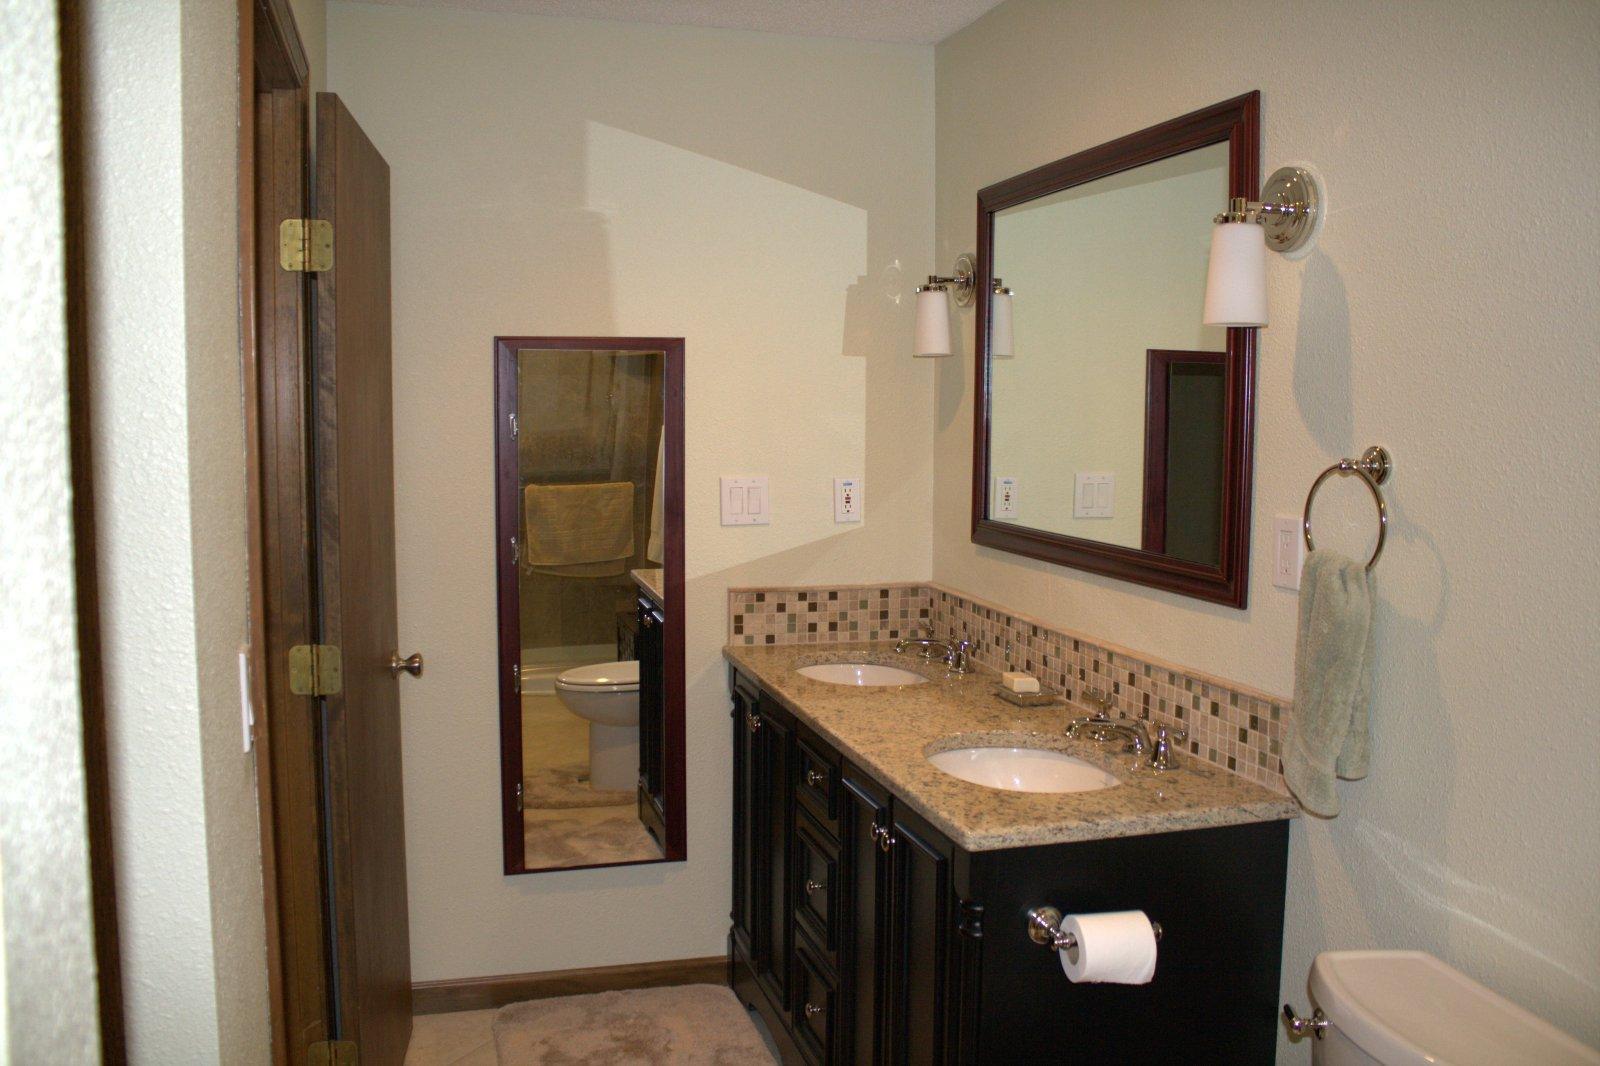 23 nice ideas of glass tile trim bathroom